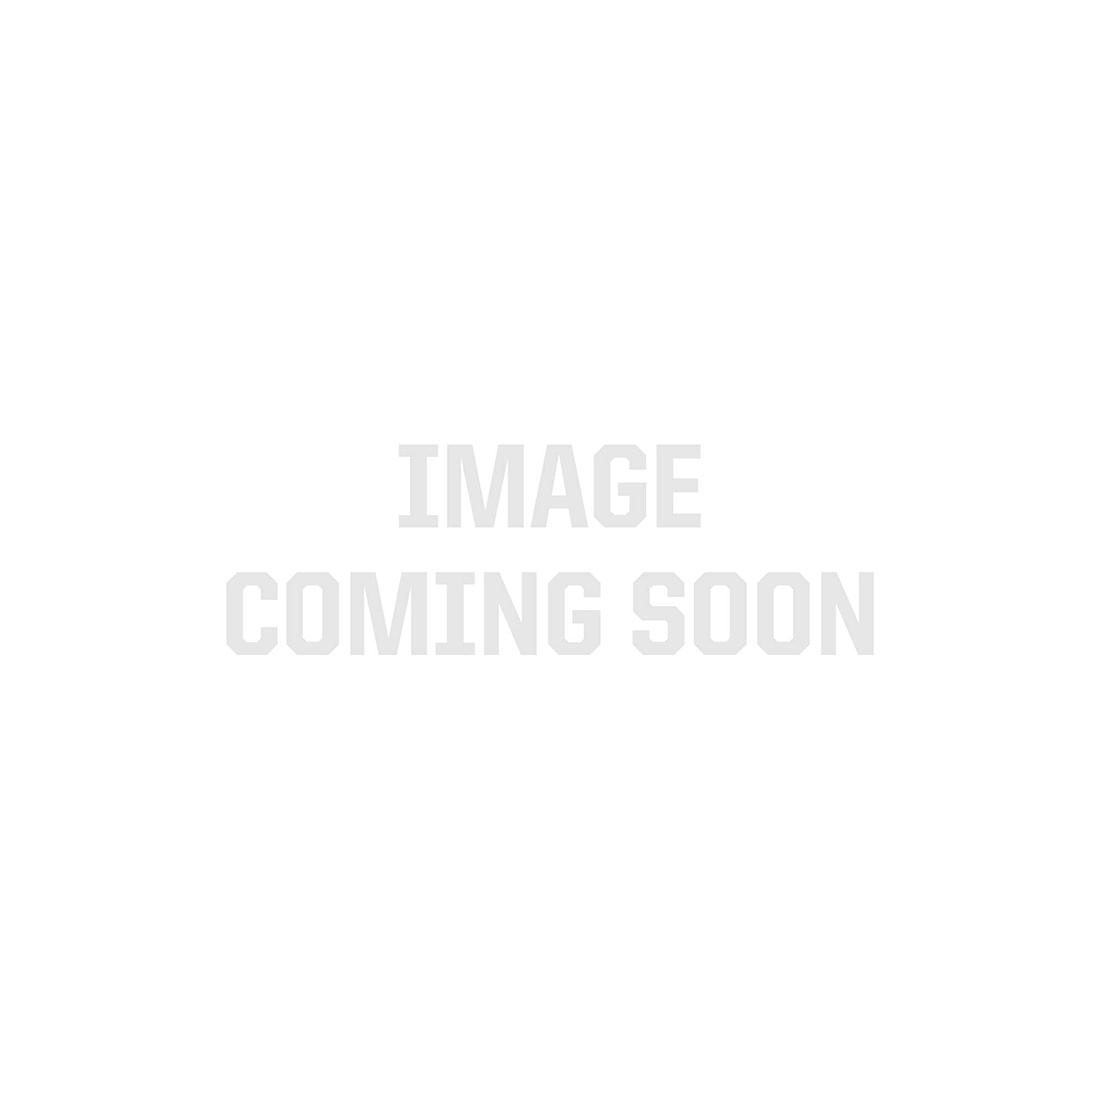 Waterproof Amber 5050 Single Row CurrentControl LED Strip Light, 60/m, 12mm wide, Sample Kit